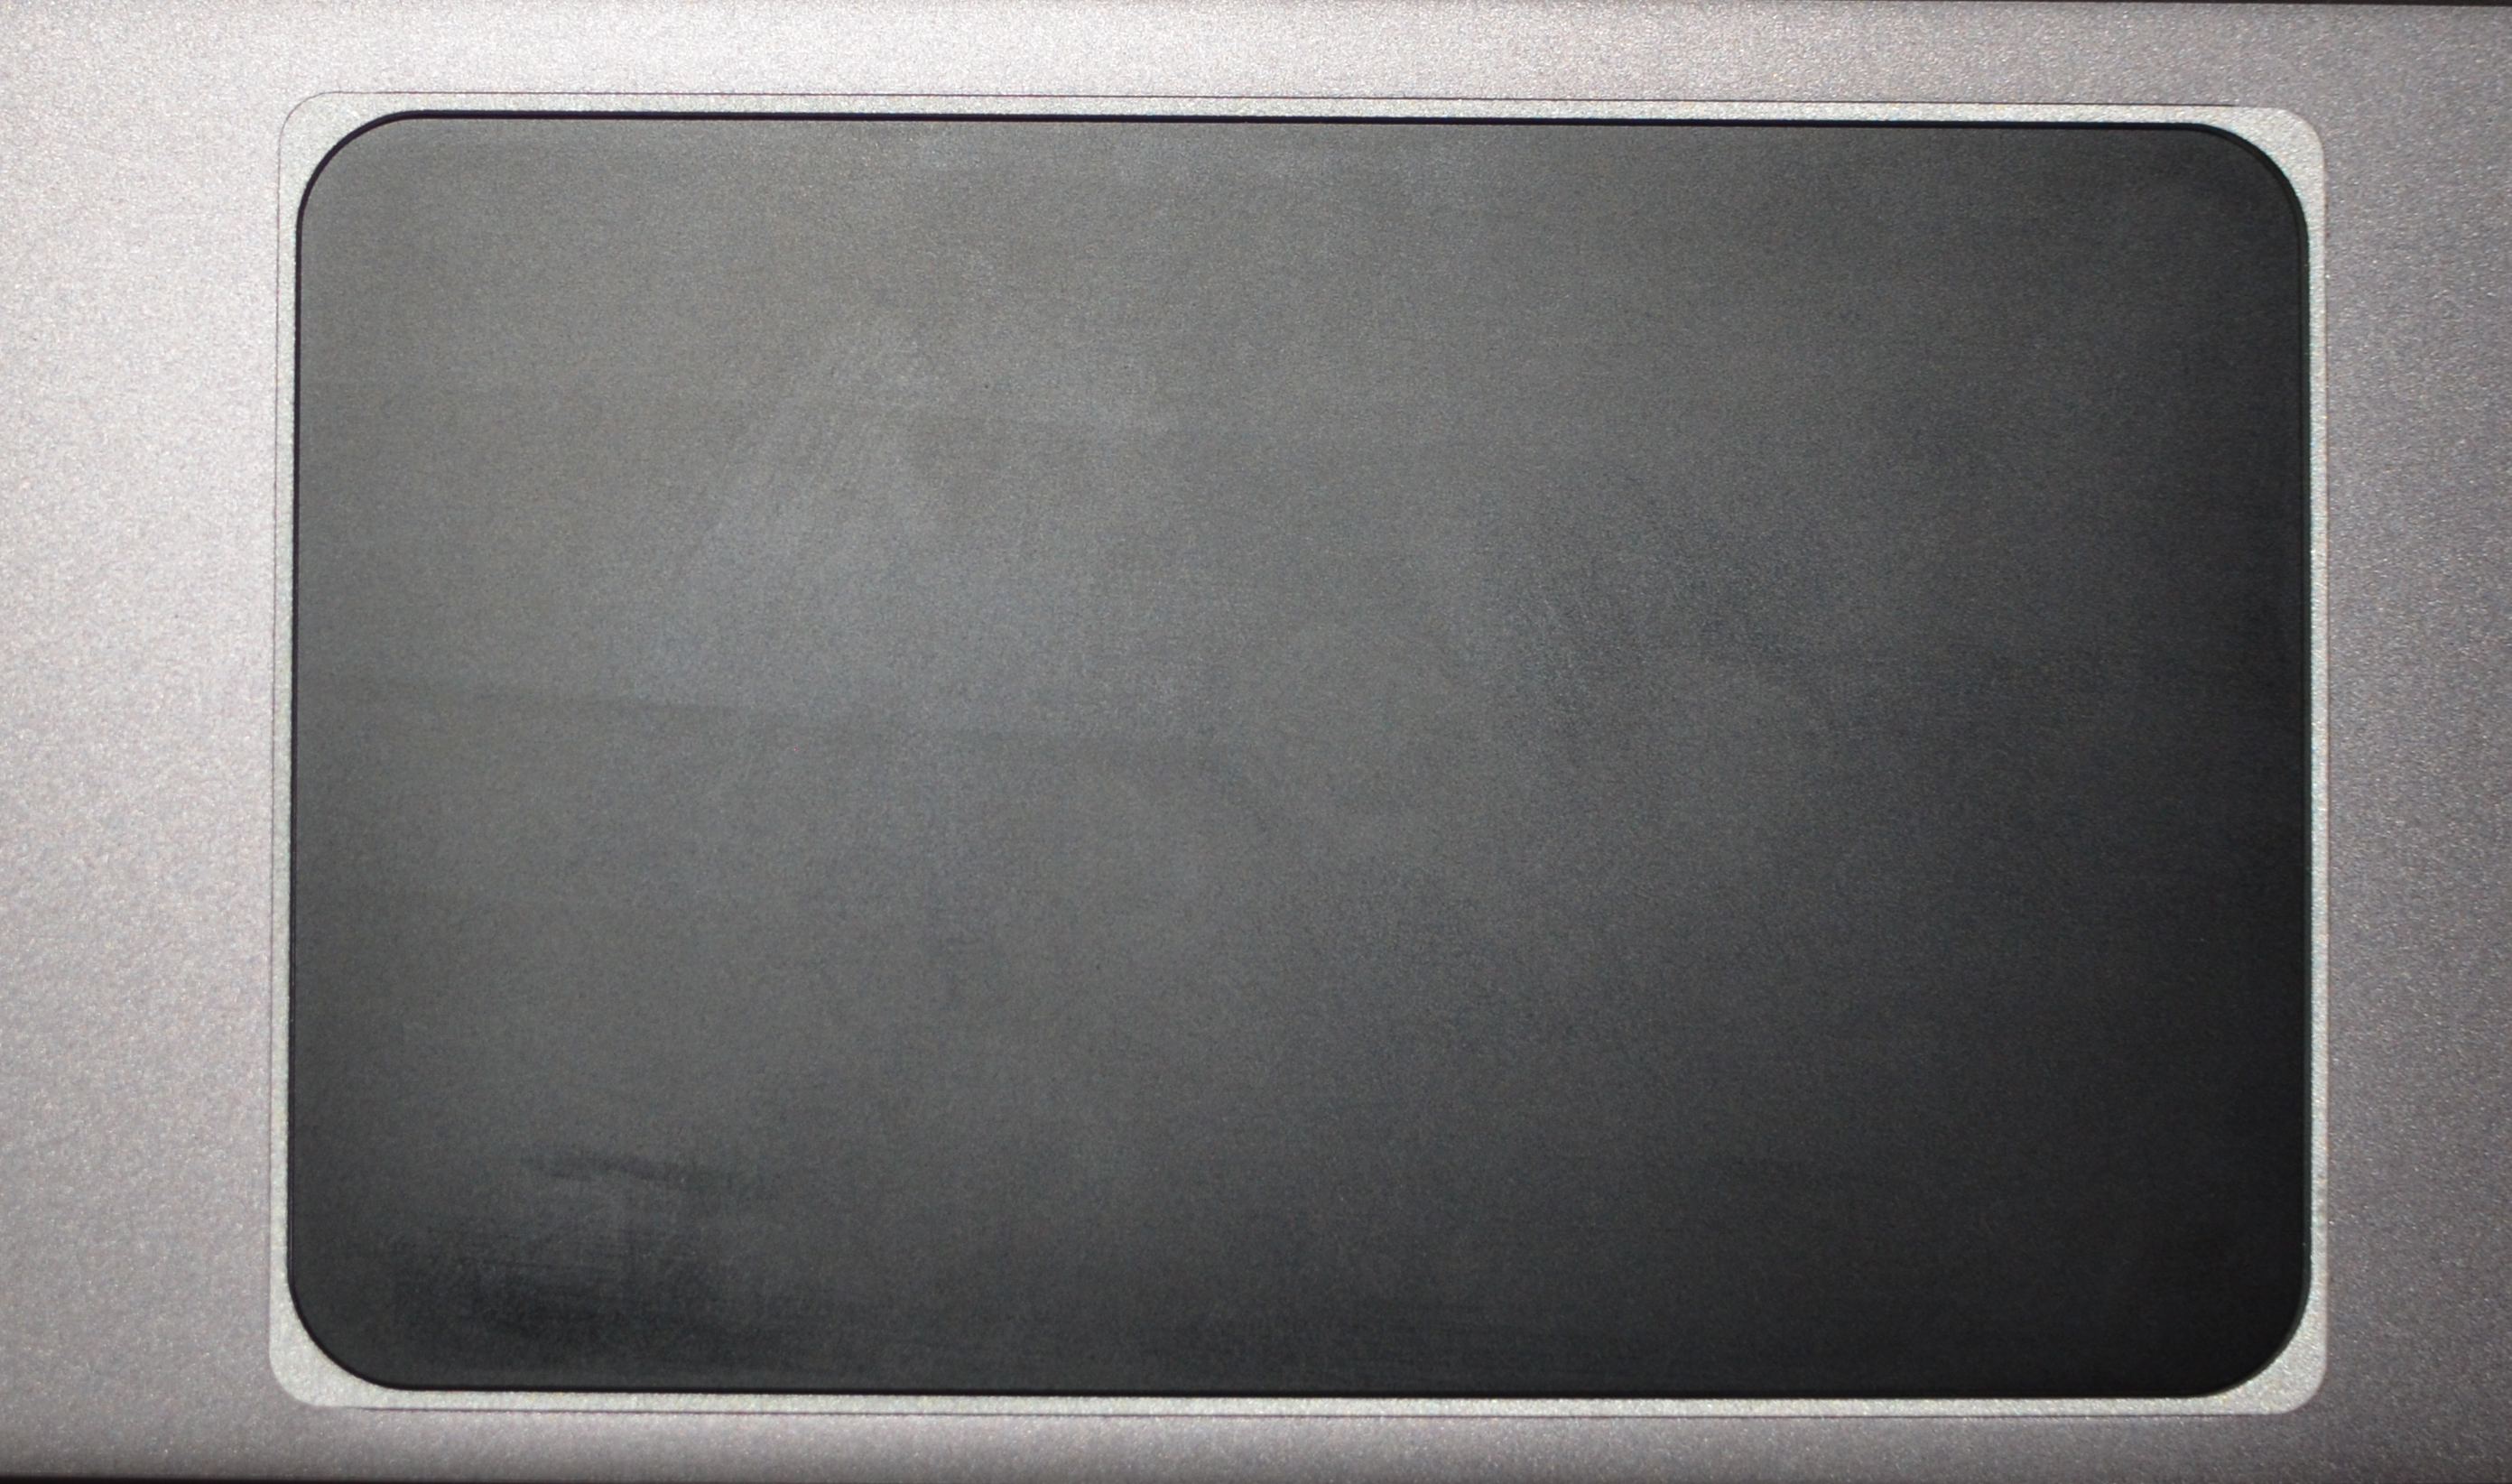 Synaptics: Dünne Ultrabook-Tastatur mit Gestenerkennung - Synaptics Forcepad (Bild: Synaptics)